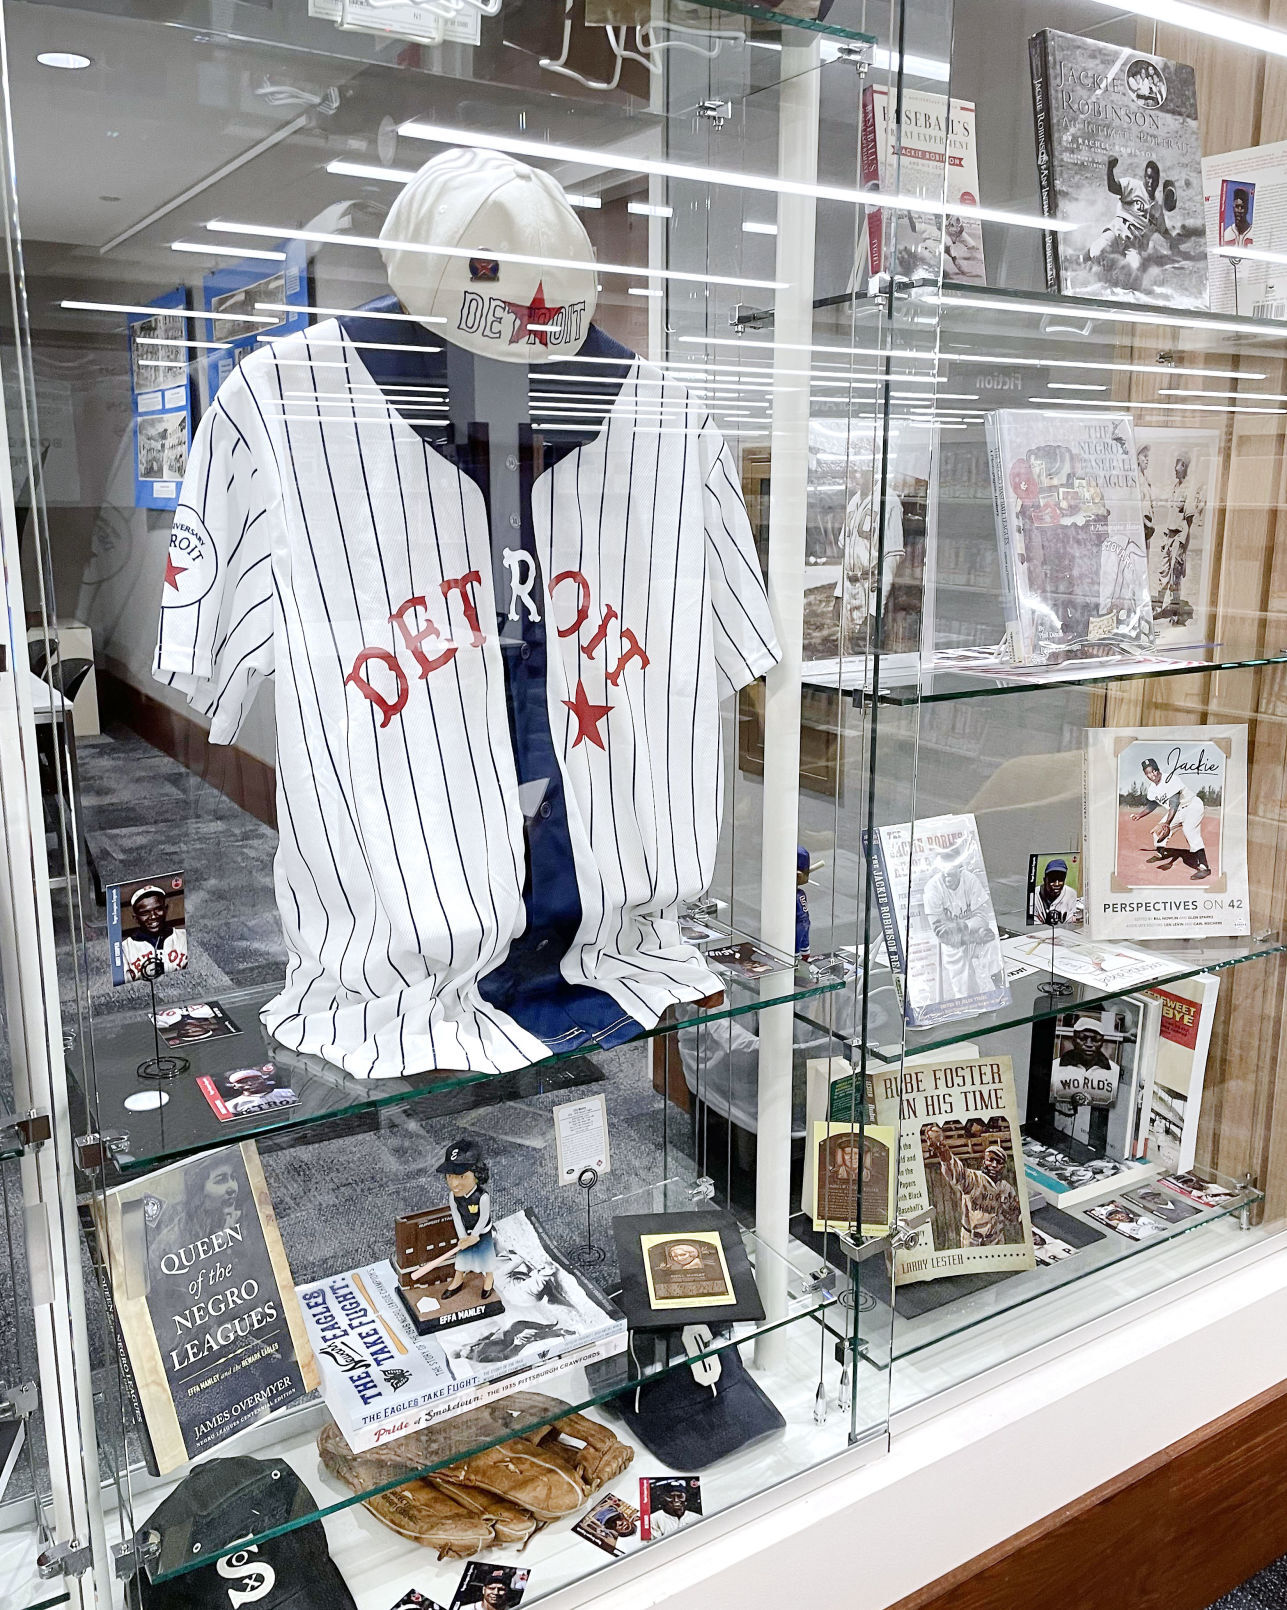 Negro Leagues memorabilia display at Hedberg Public Library